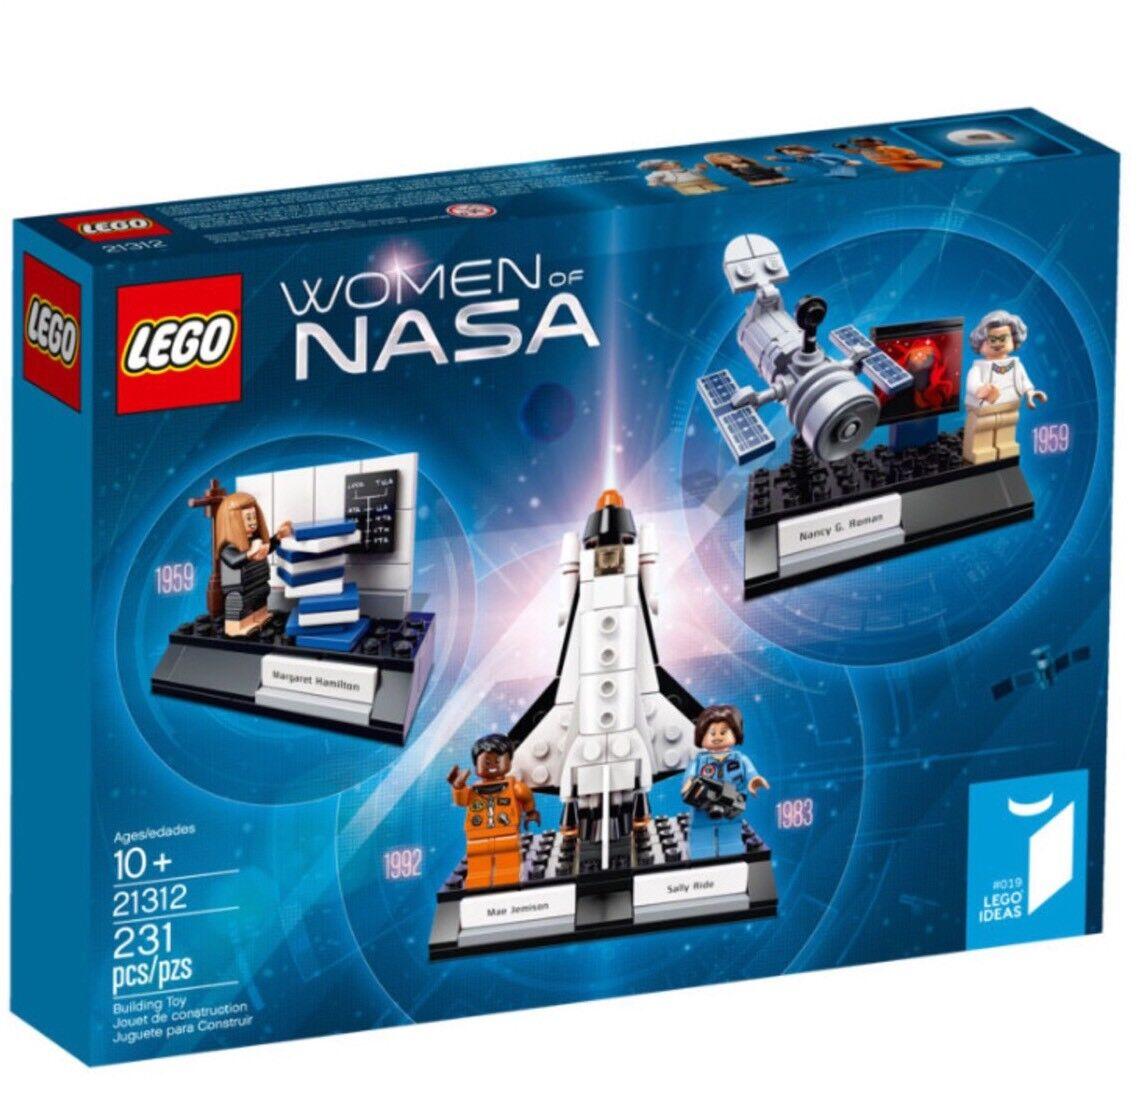 LEGO 21312 Ideas Women of NASA  - BNISB